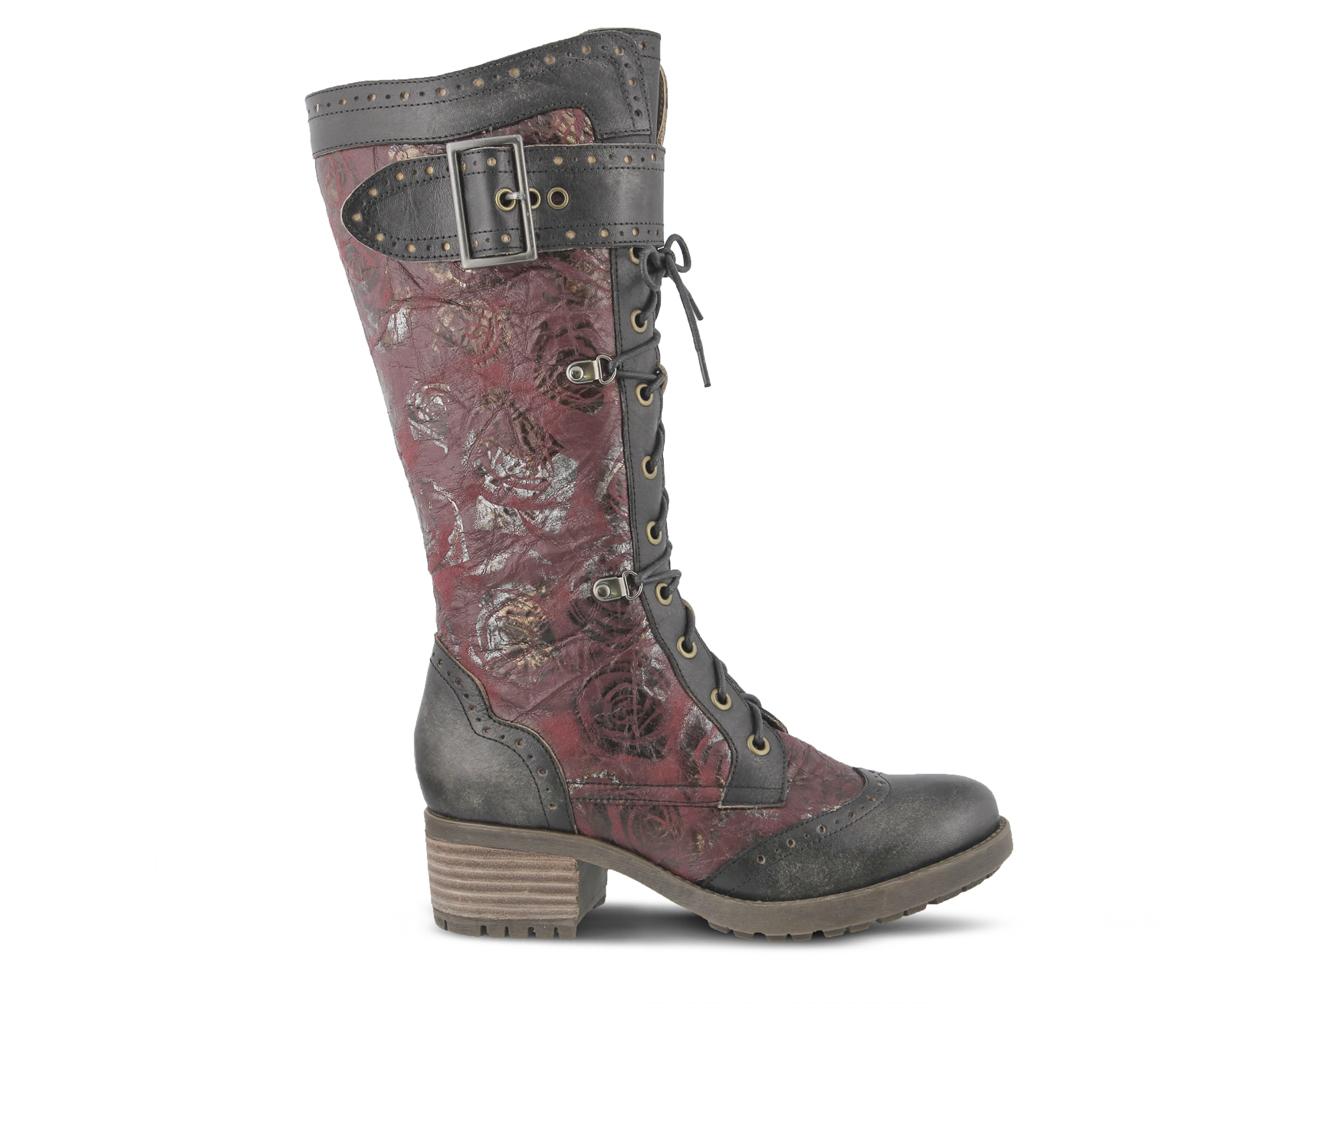 L'Artiste Kisha Women's Boots (Black Leather)